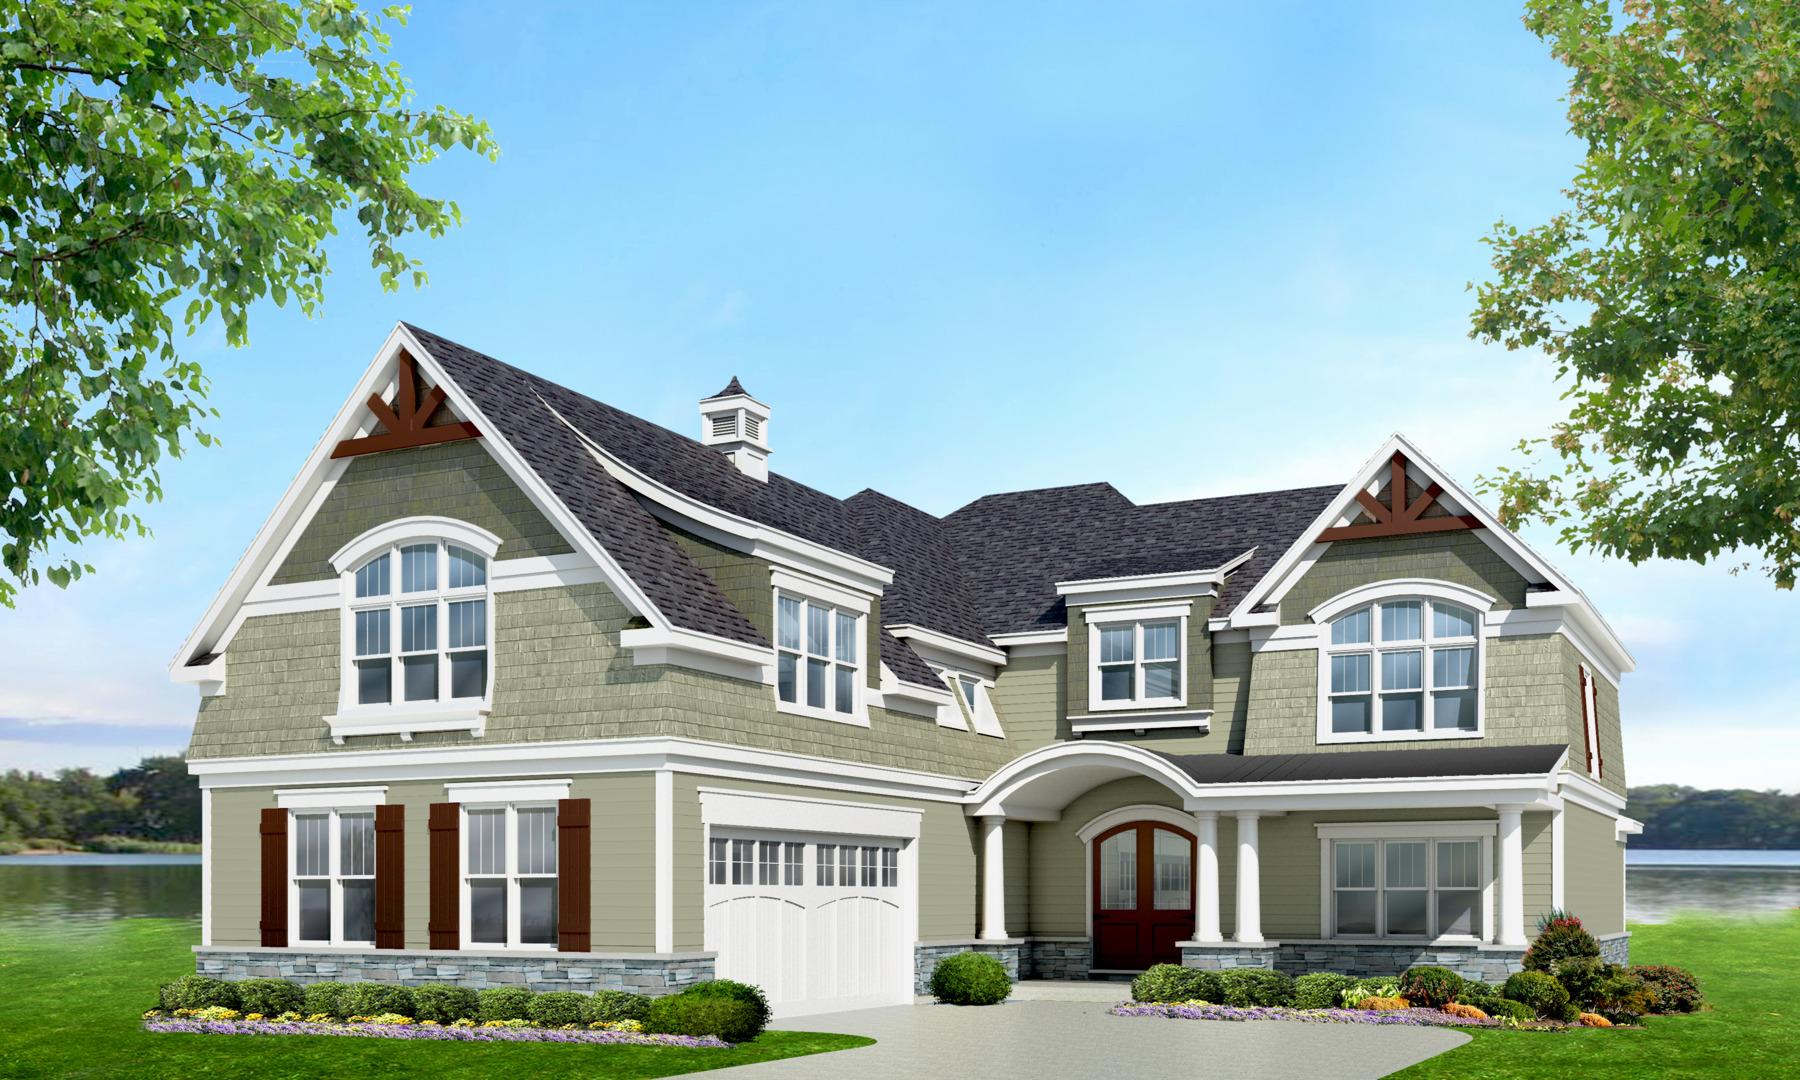 2120 S Shore Drive, Lakewood, IL 60014